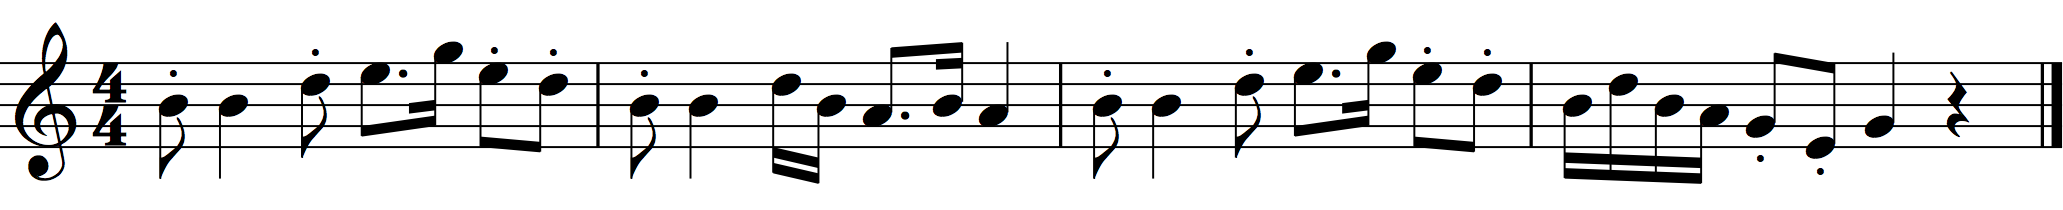 sui-jiers-theme-verse